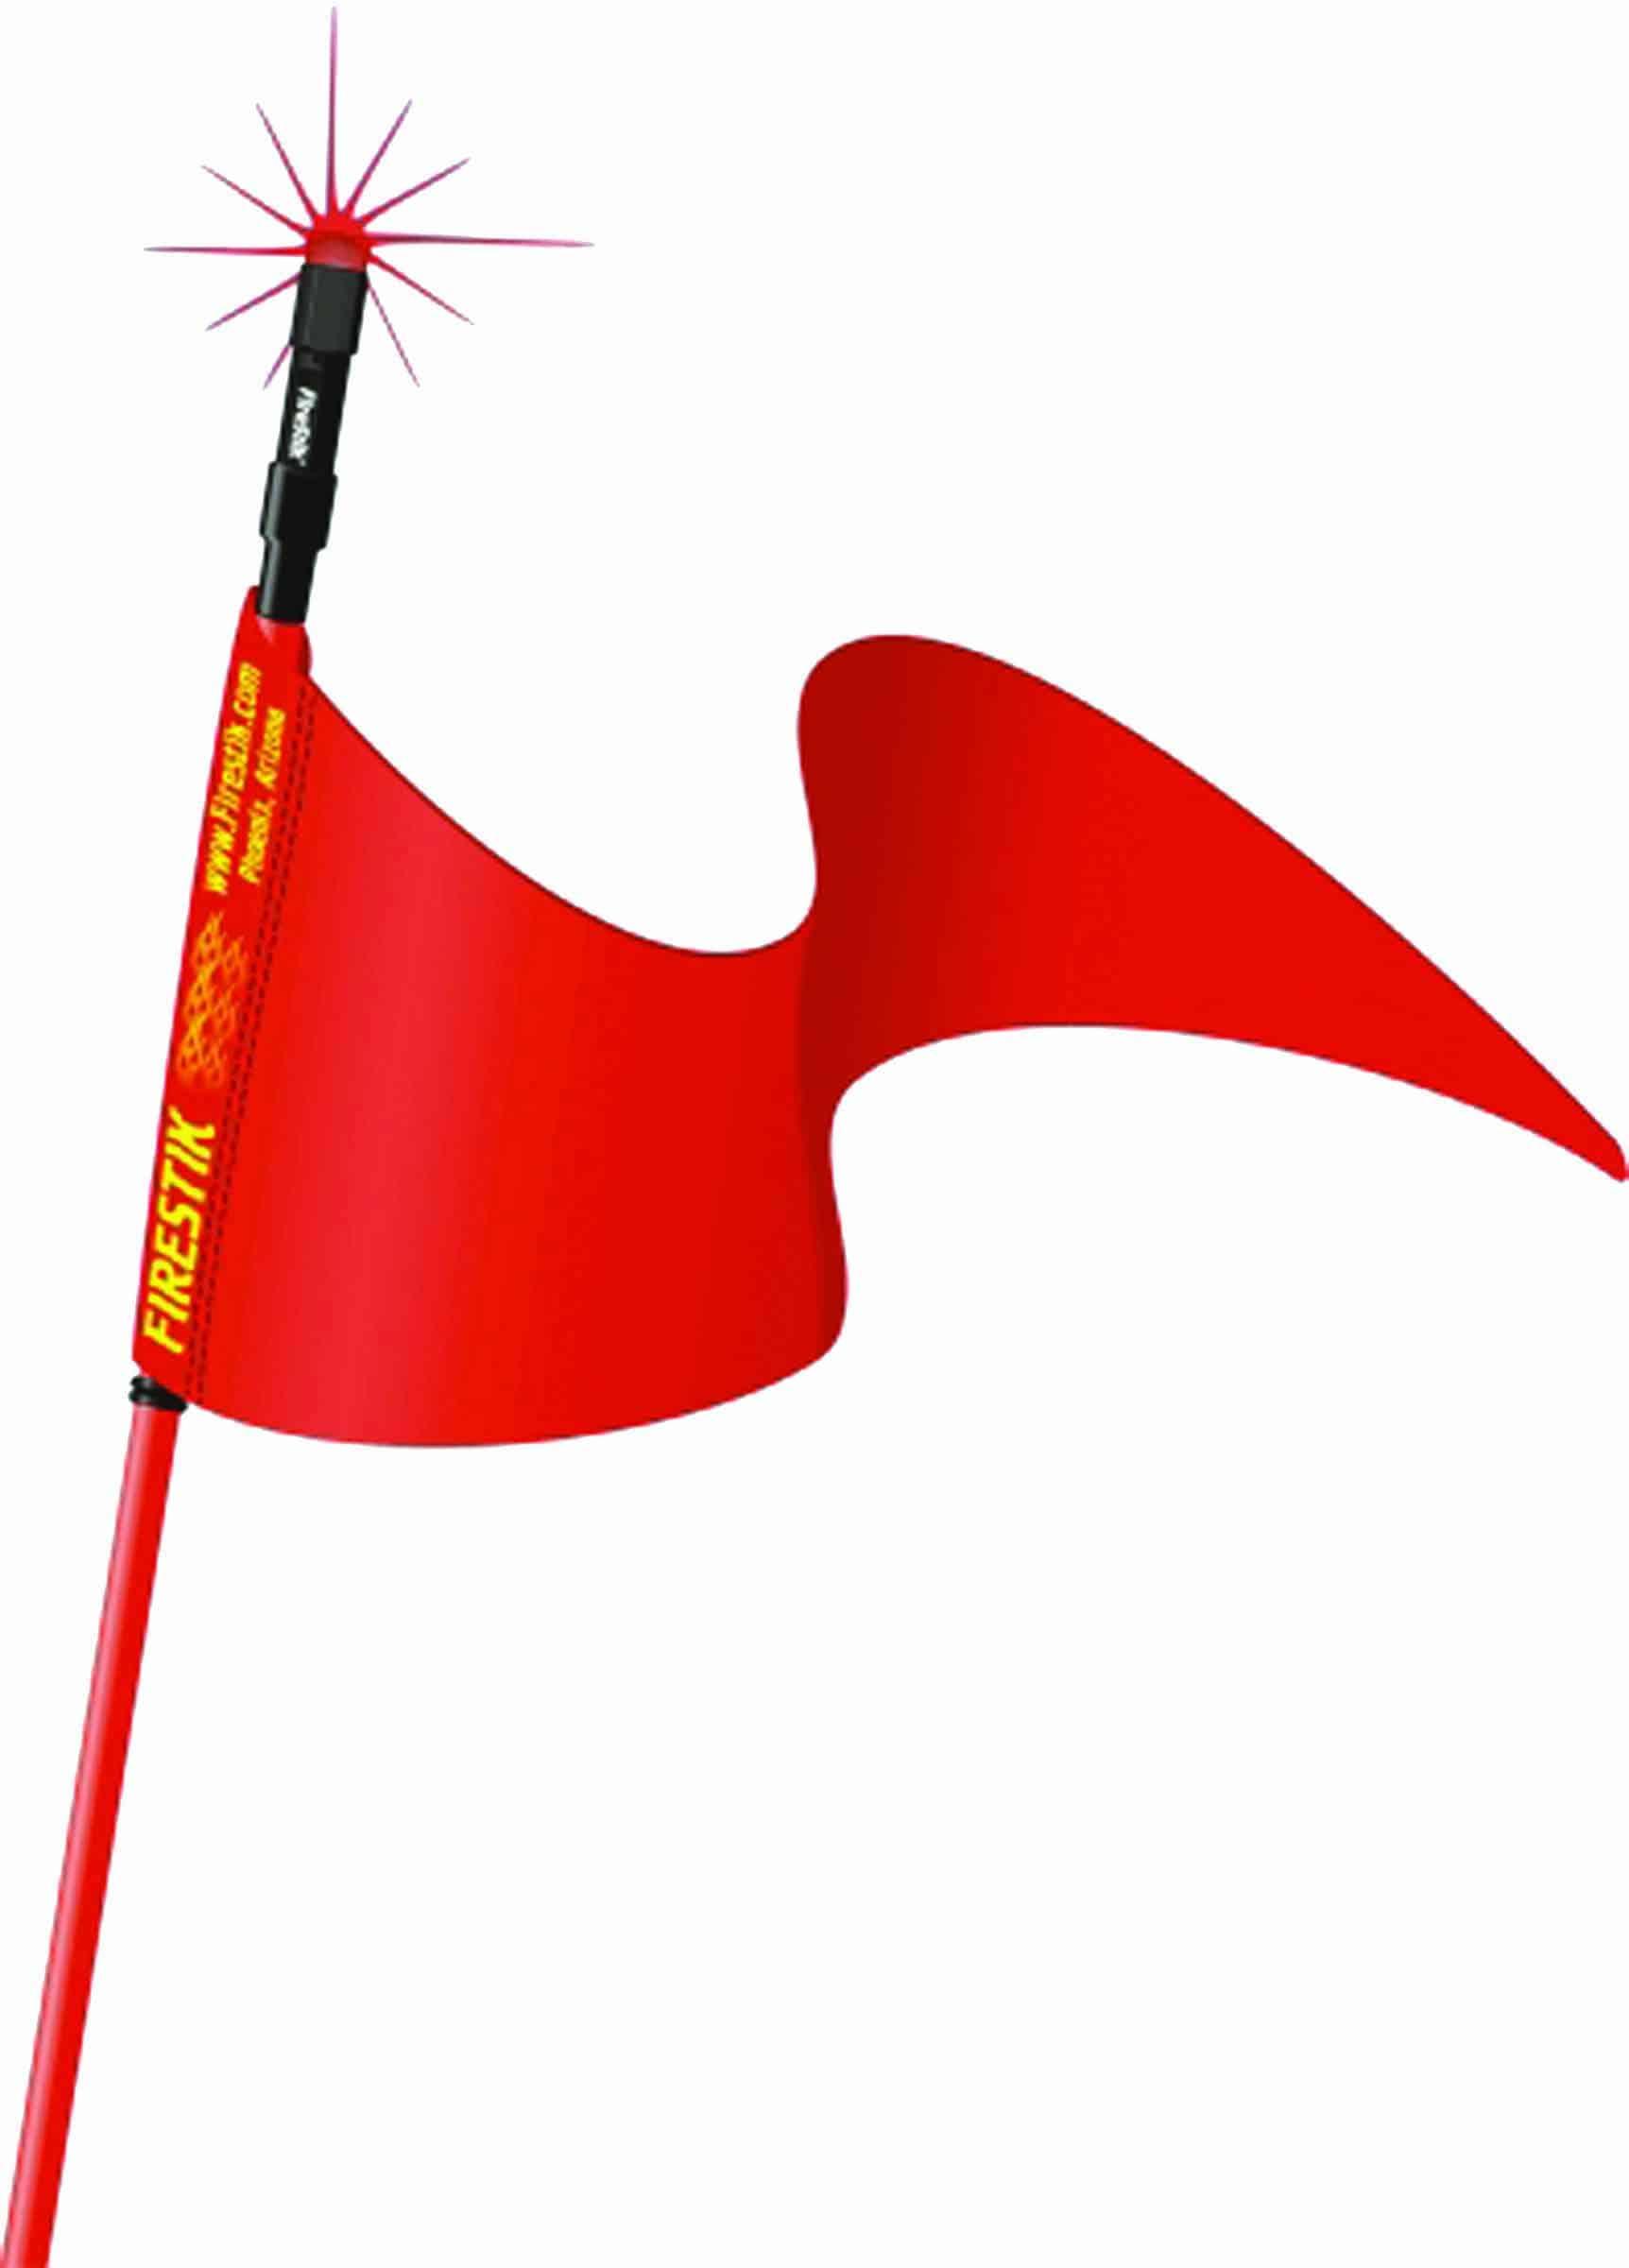 "SR3-R - Firestik 3' Red Strobe Ready Stik (3/8""X24 Base) With Flag"